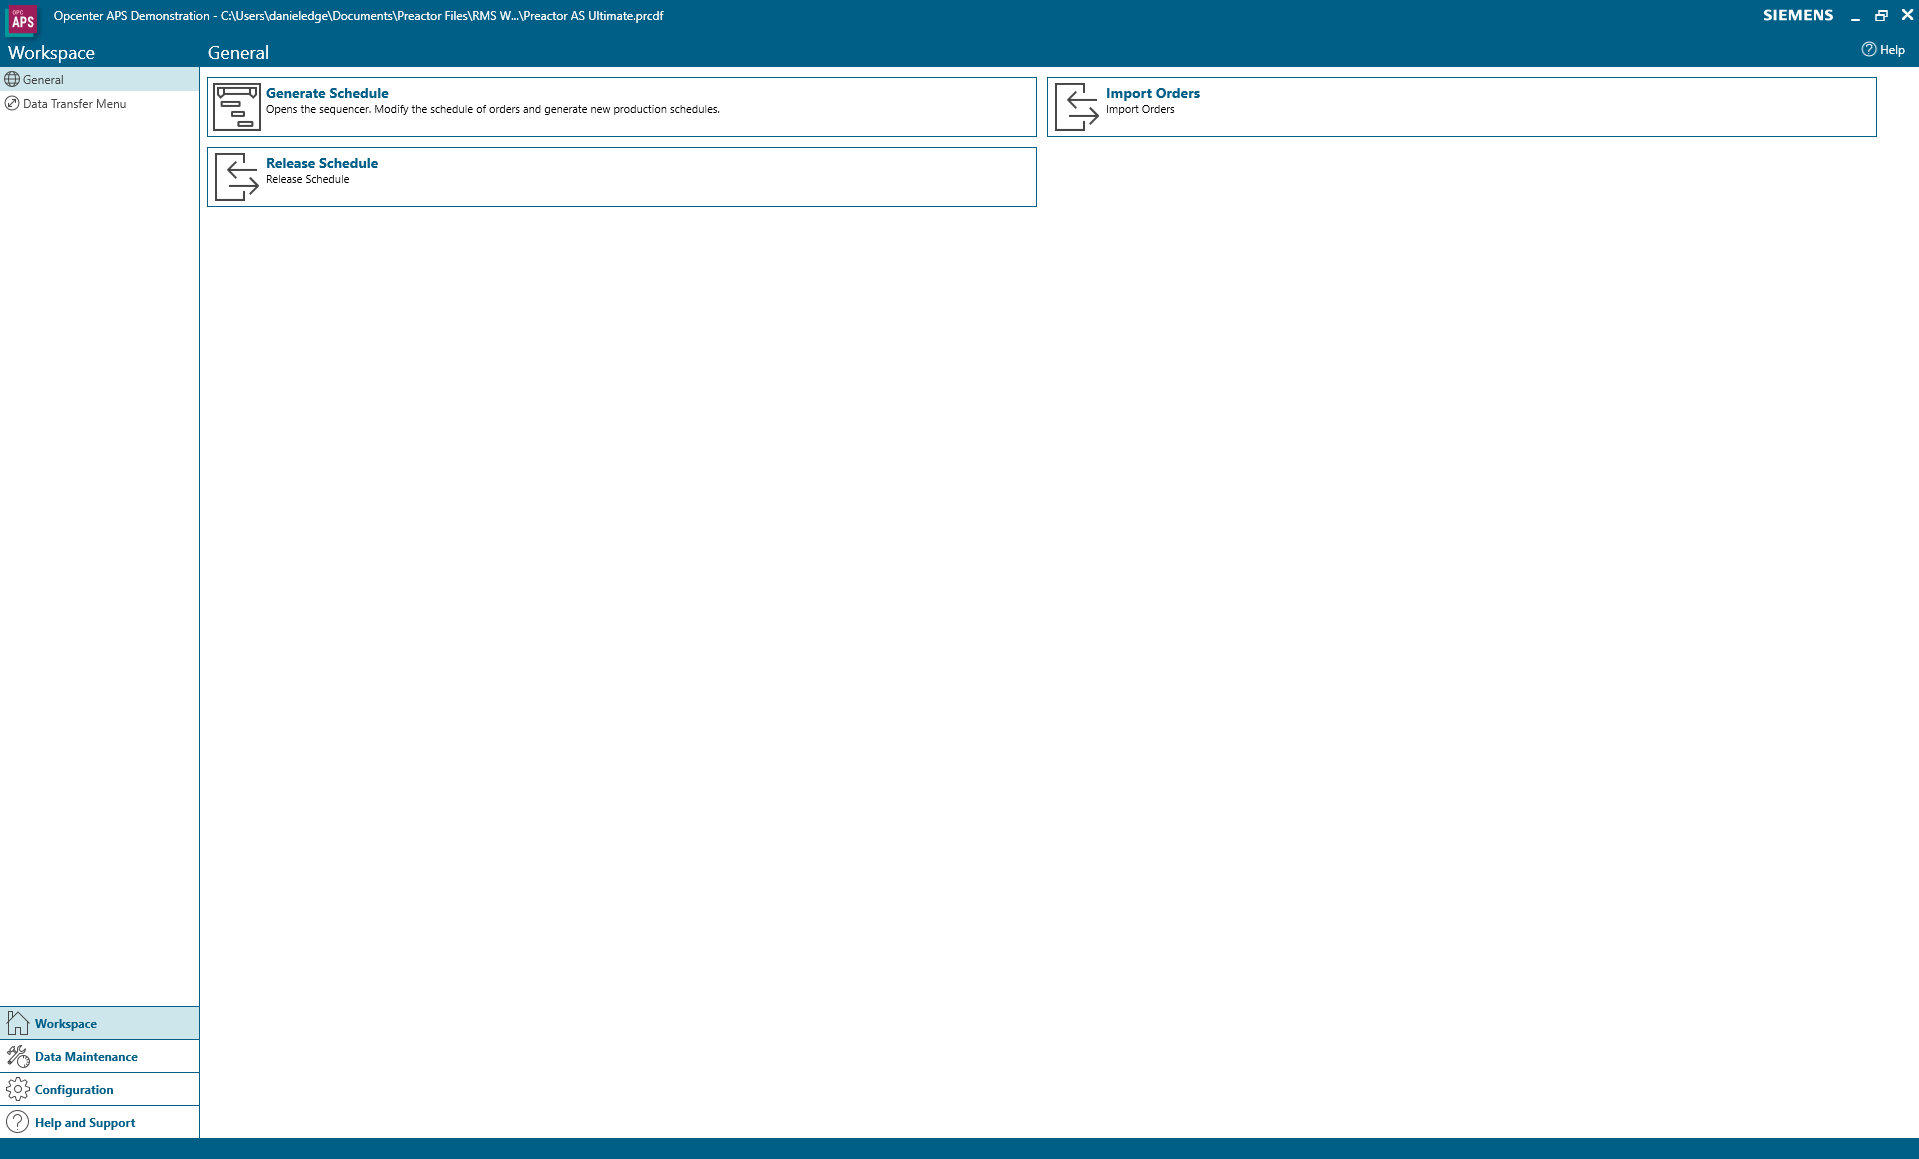 The workspace menu in Opcenter APS